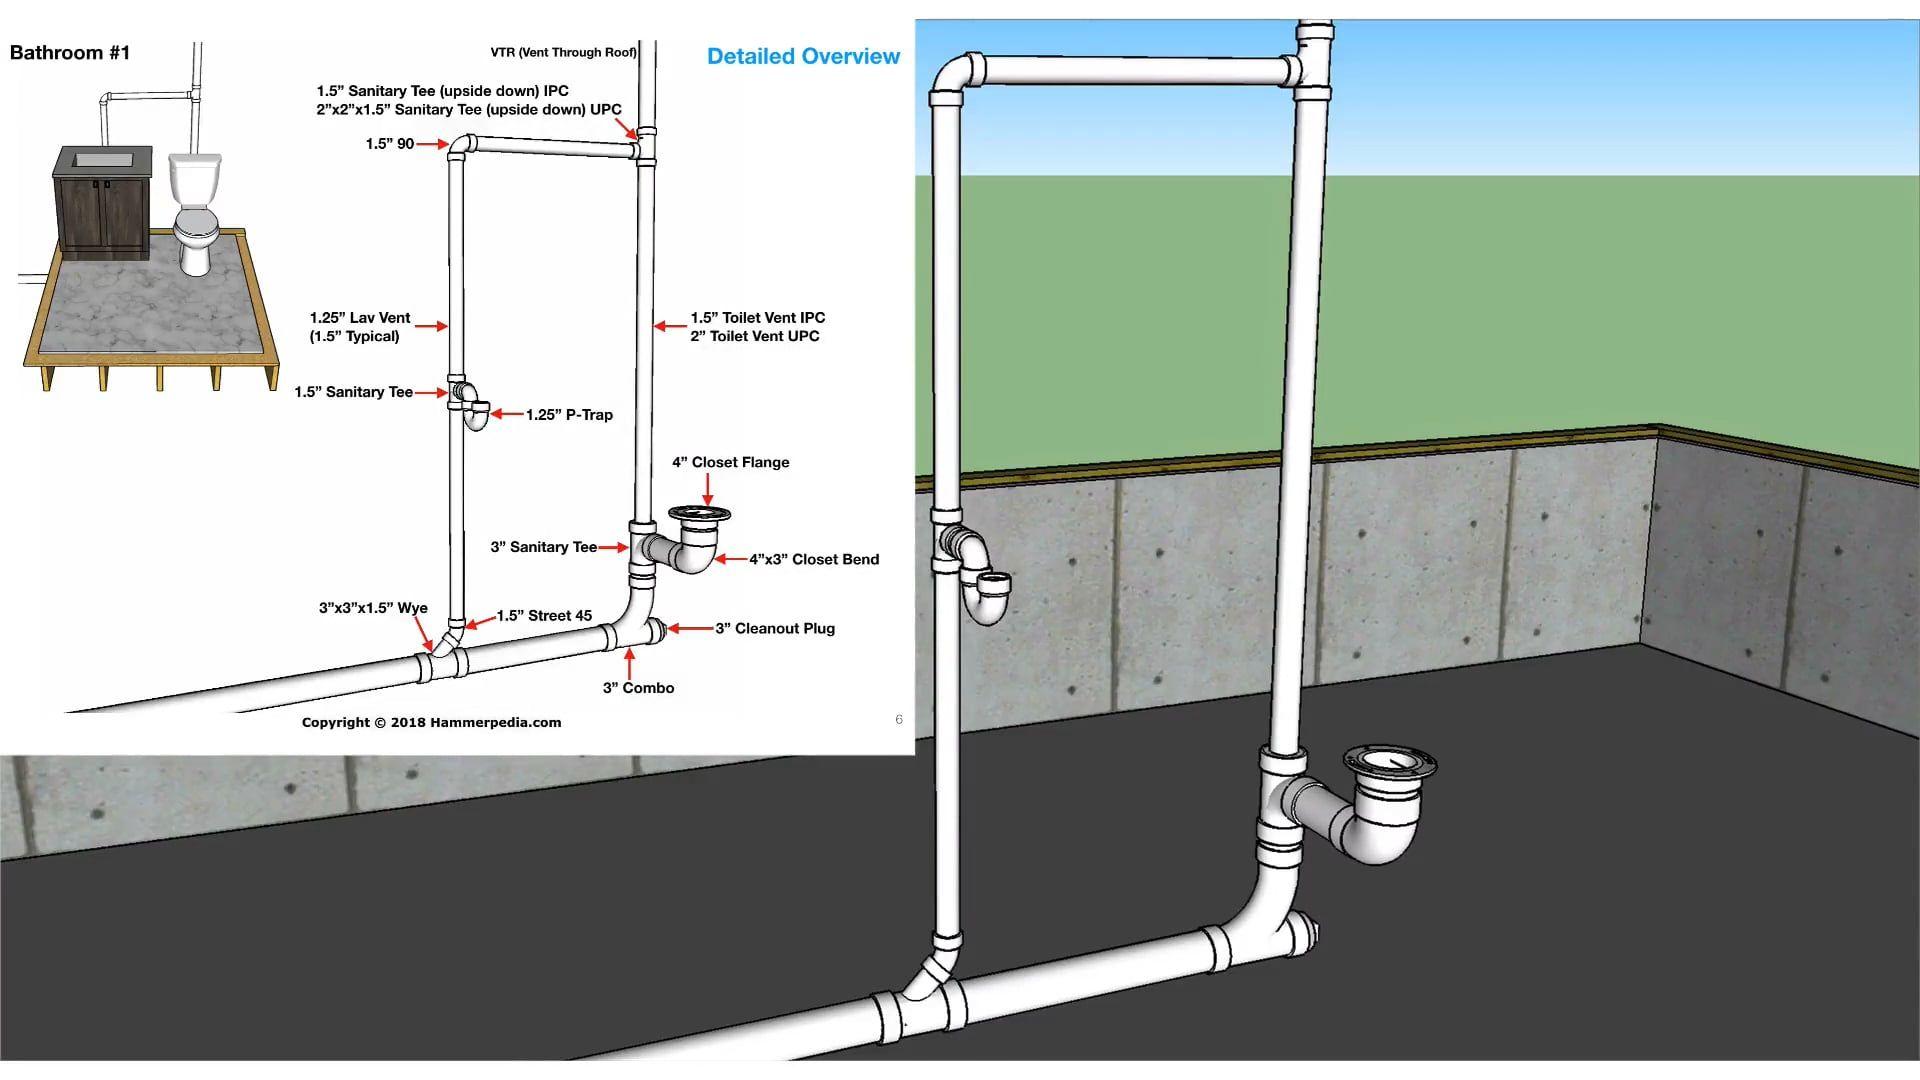 Vsl 17 Diagrams 49 Bathroom Construction Bathroom Plumbing Plumbing Installation [ jpg ]